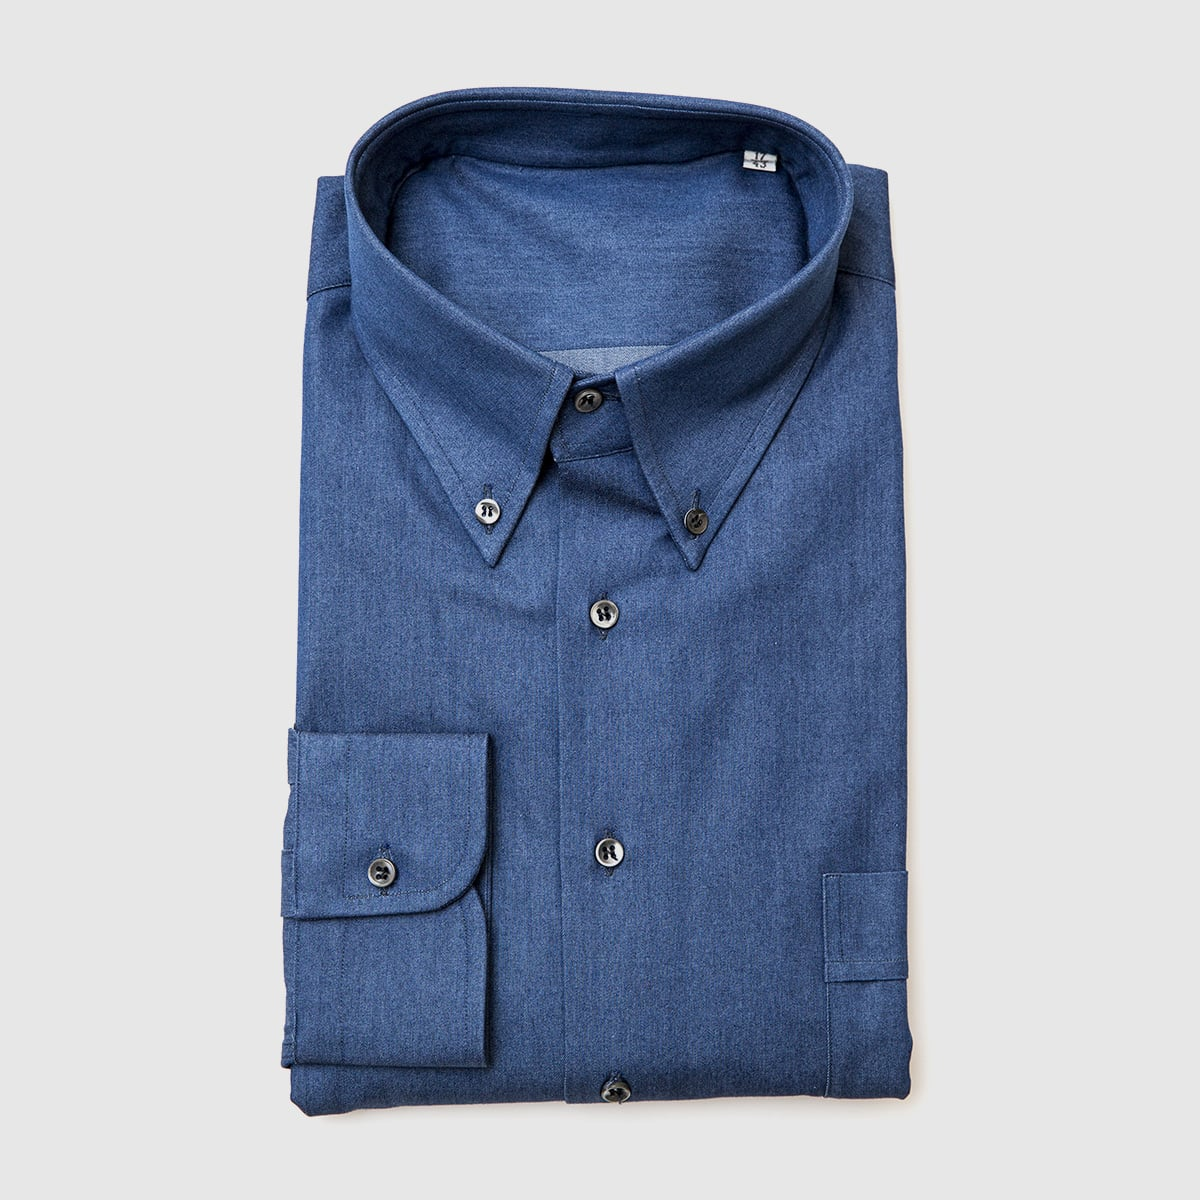 Double-twisted cotton denim shirt